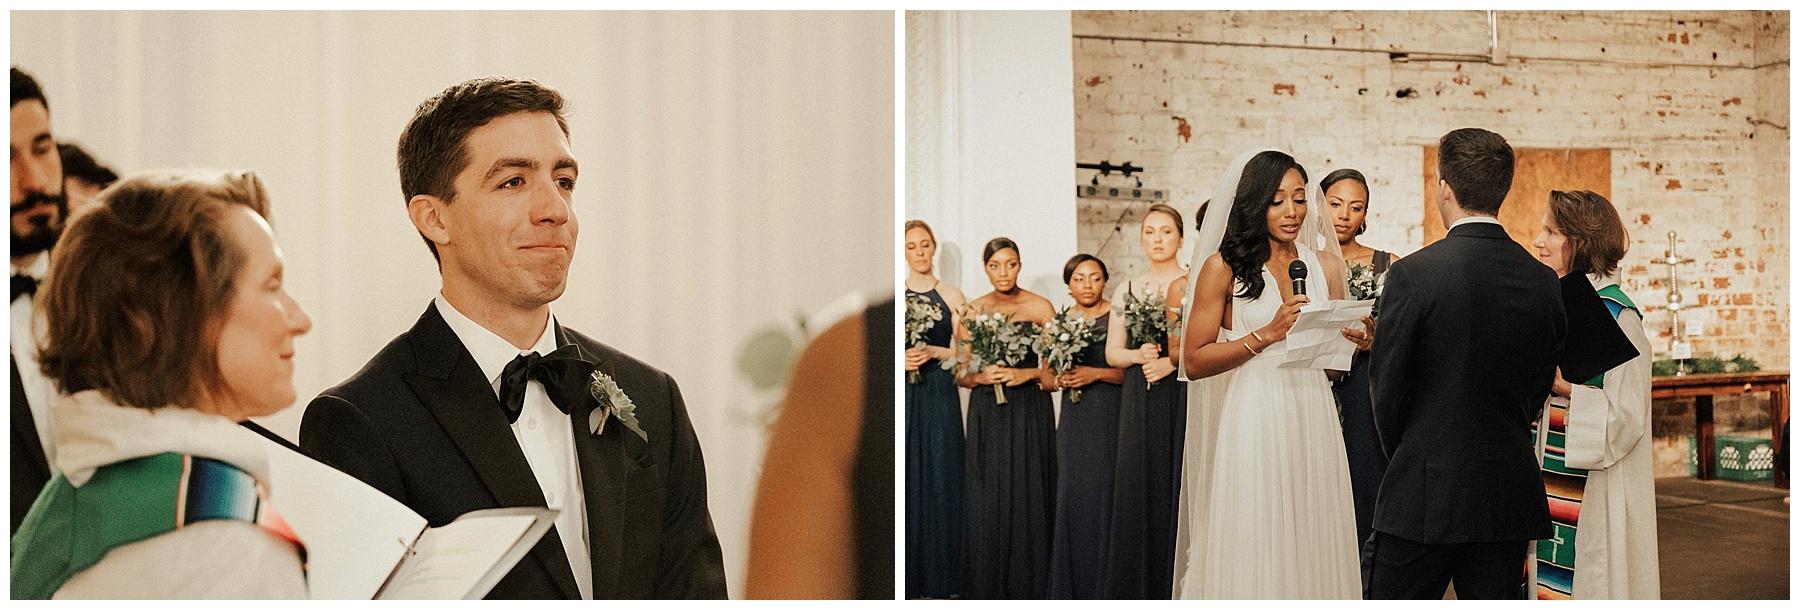 Rialto Theatre Tampa Wedding Photographer-94.jpg